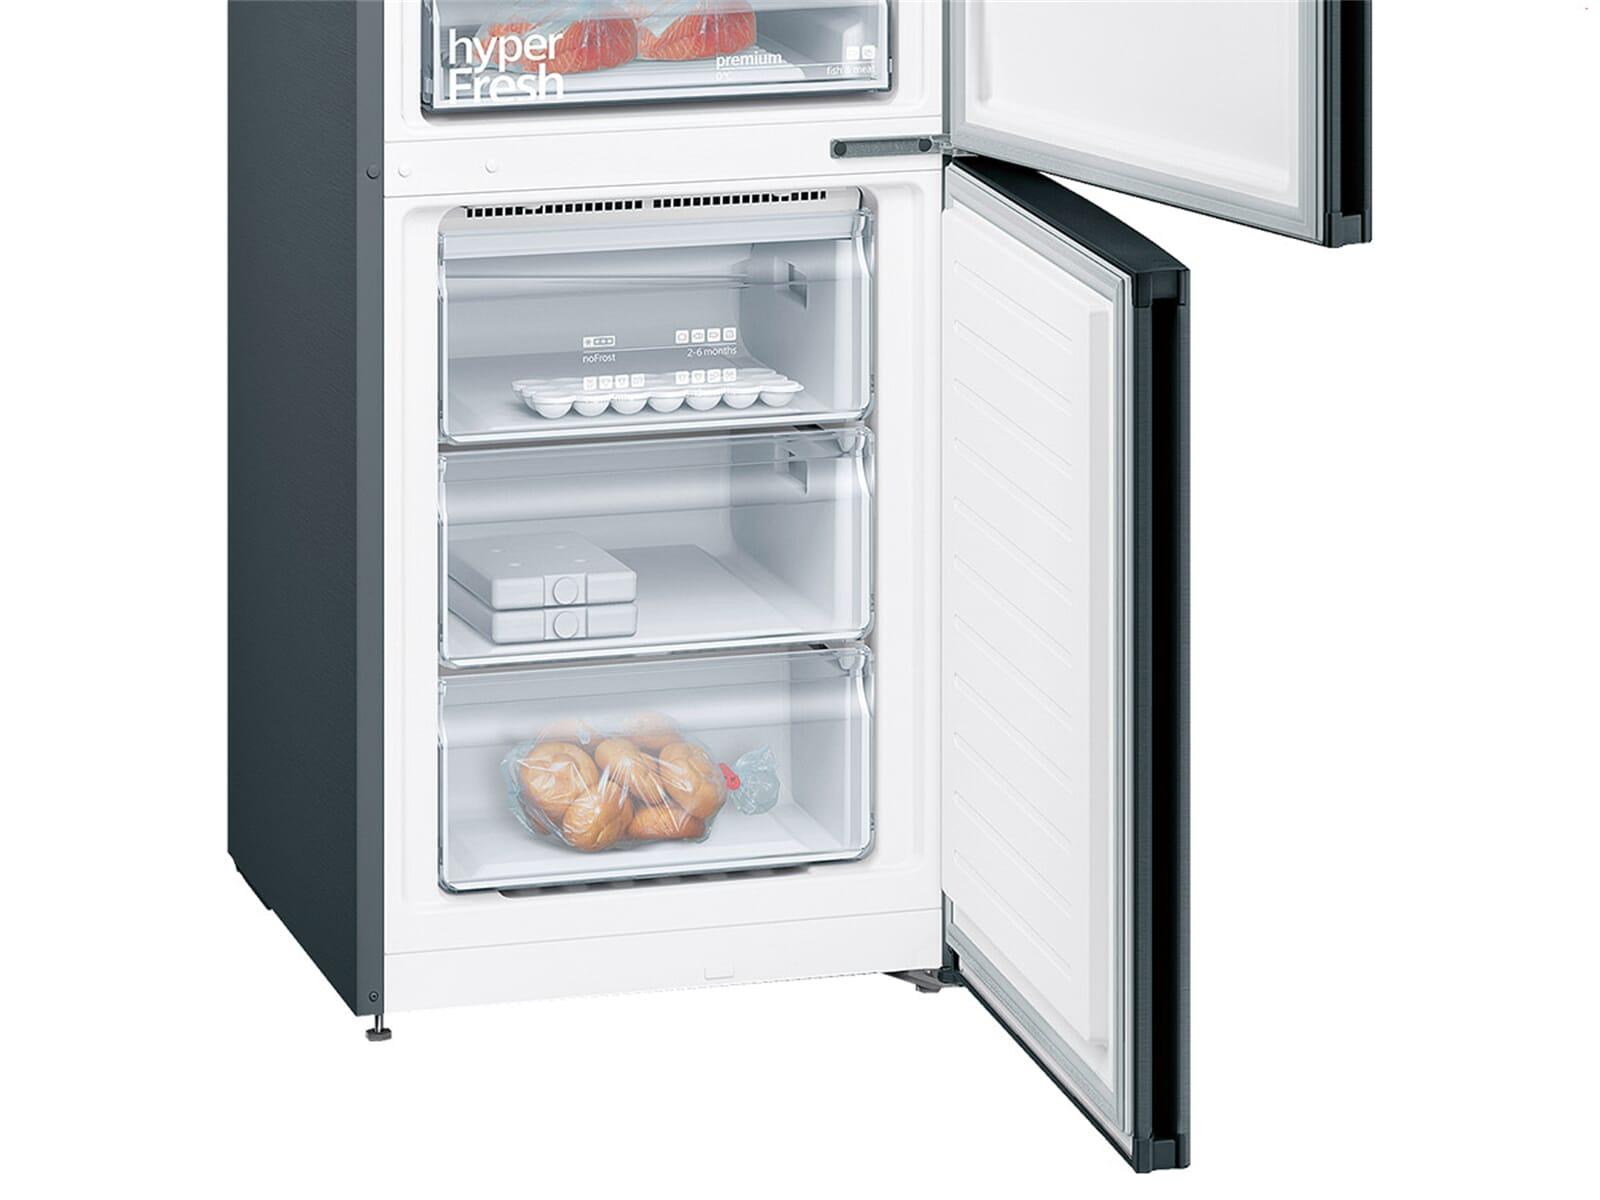 Siemens Kühlschrank Reset : Siemens kg39fpb45 kühl gefrierkombination black inox